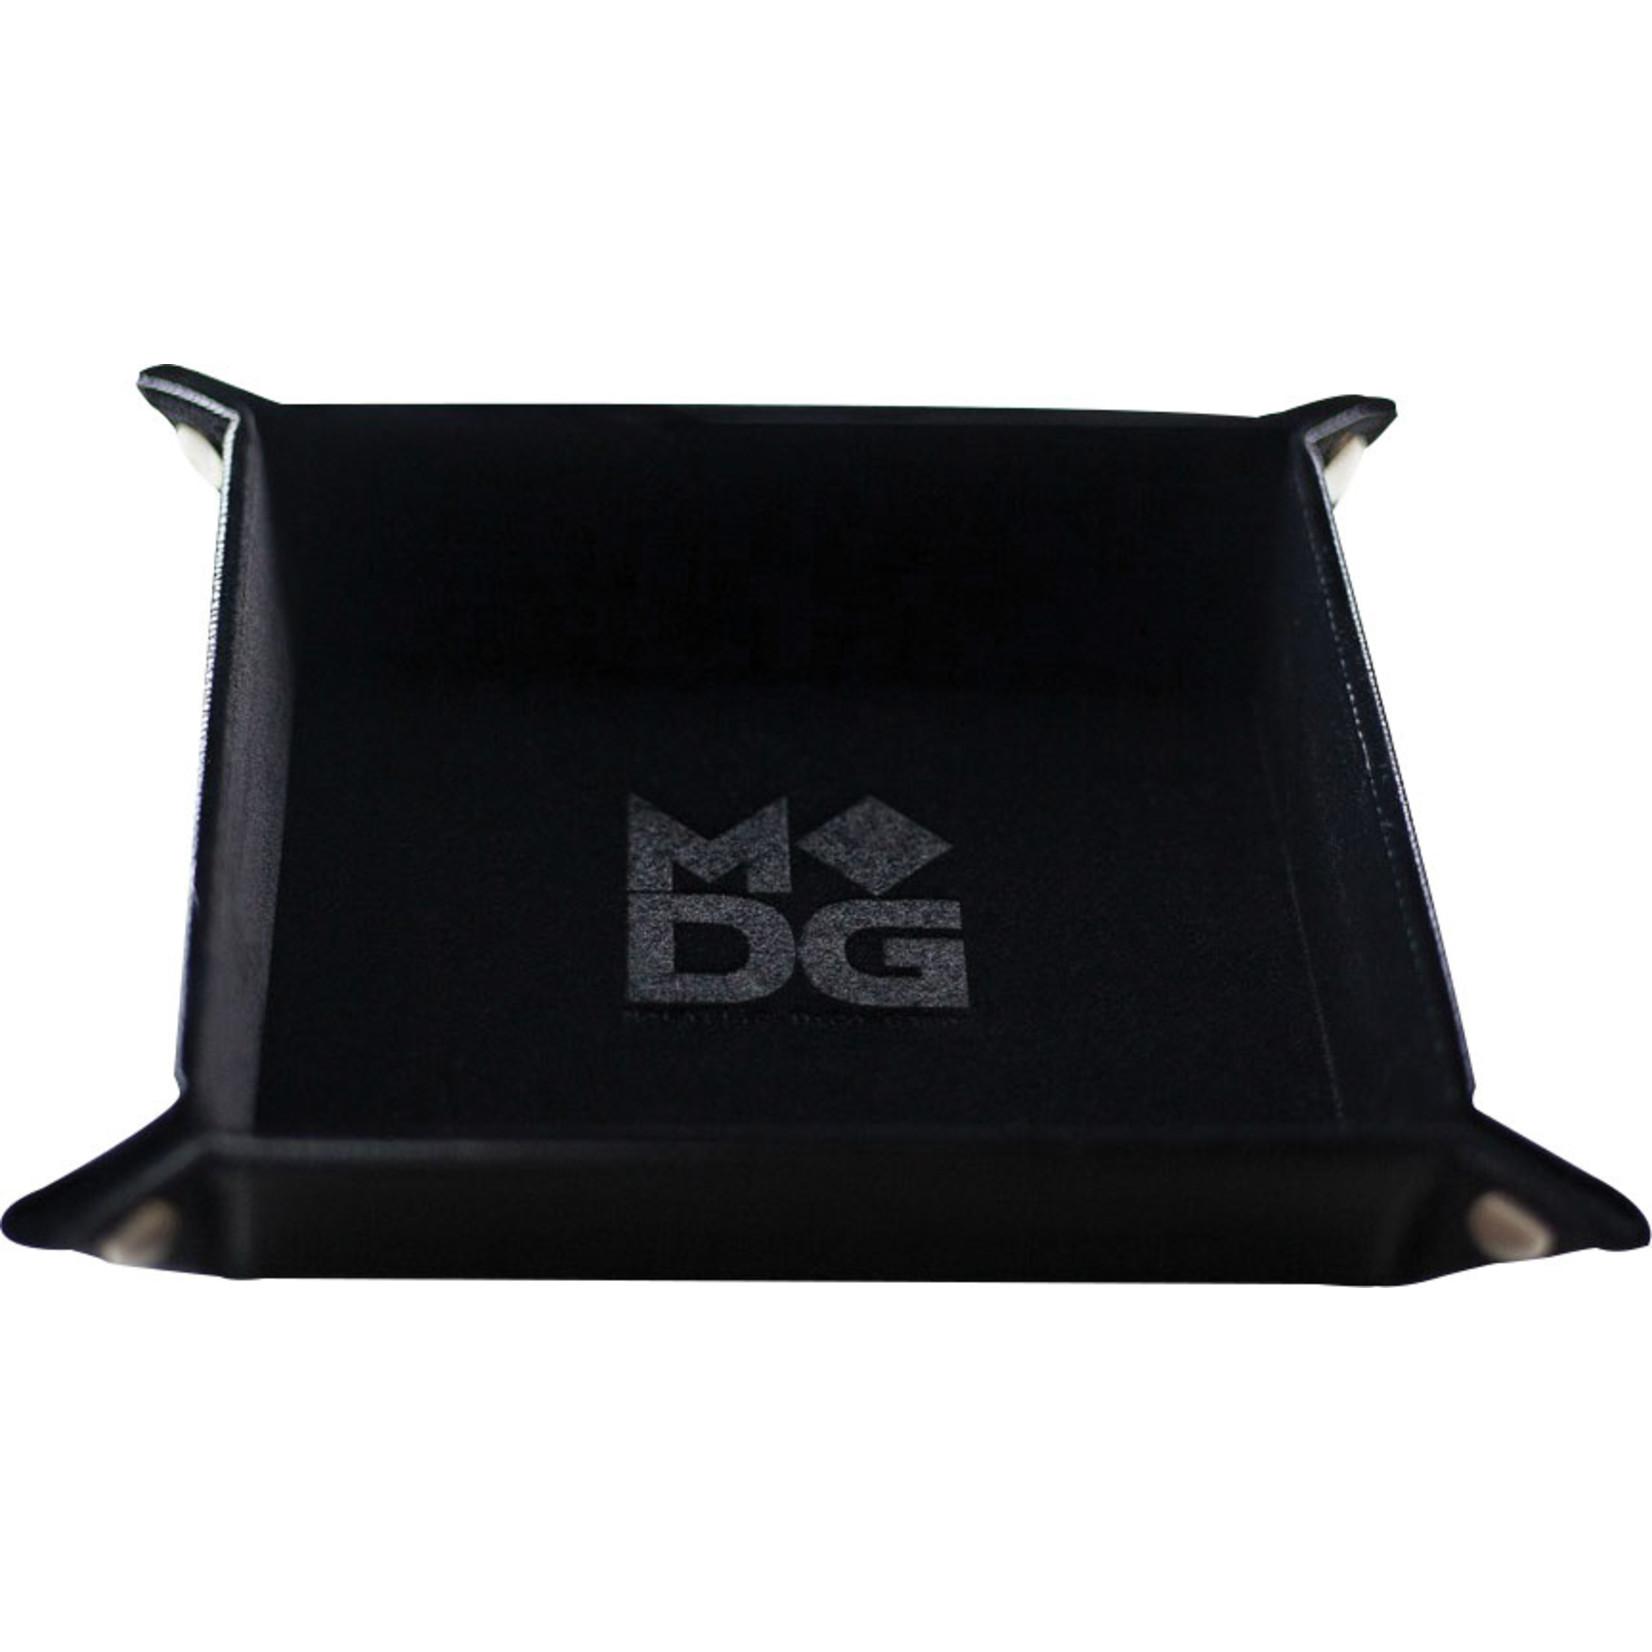 Black Velvet Folding Dice Tray with Leather Backing